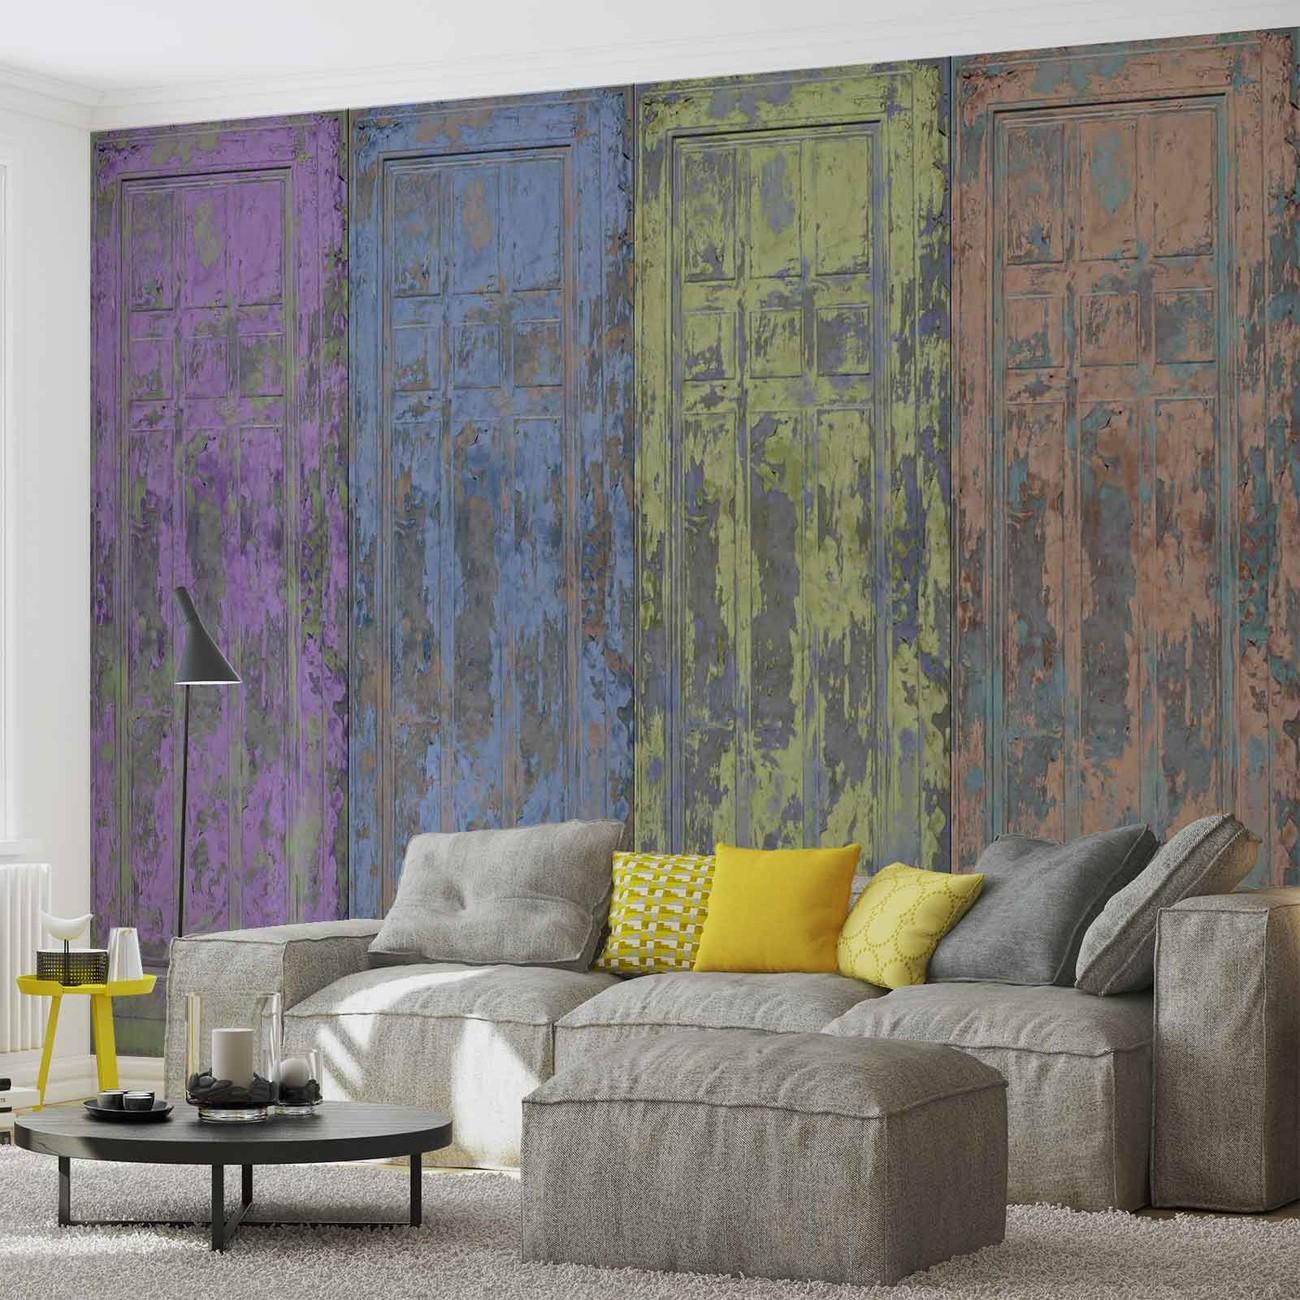 Carta da parati porte in legno rustiche verniciate for Carta da parati per porte